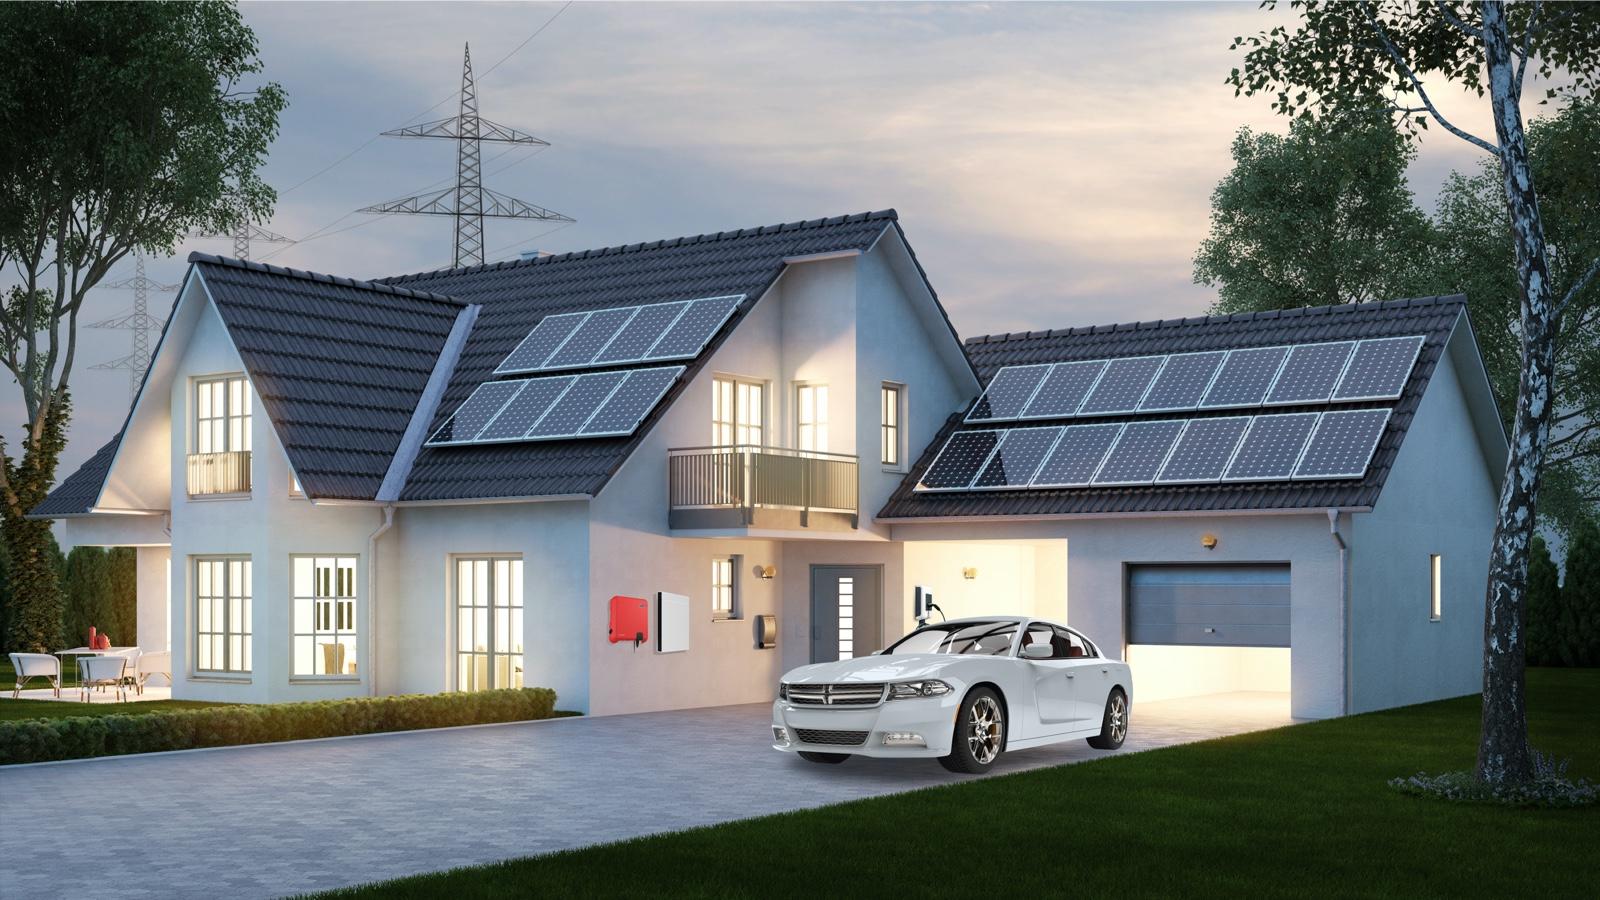 Solar Energy Expert in Ireland